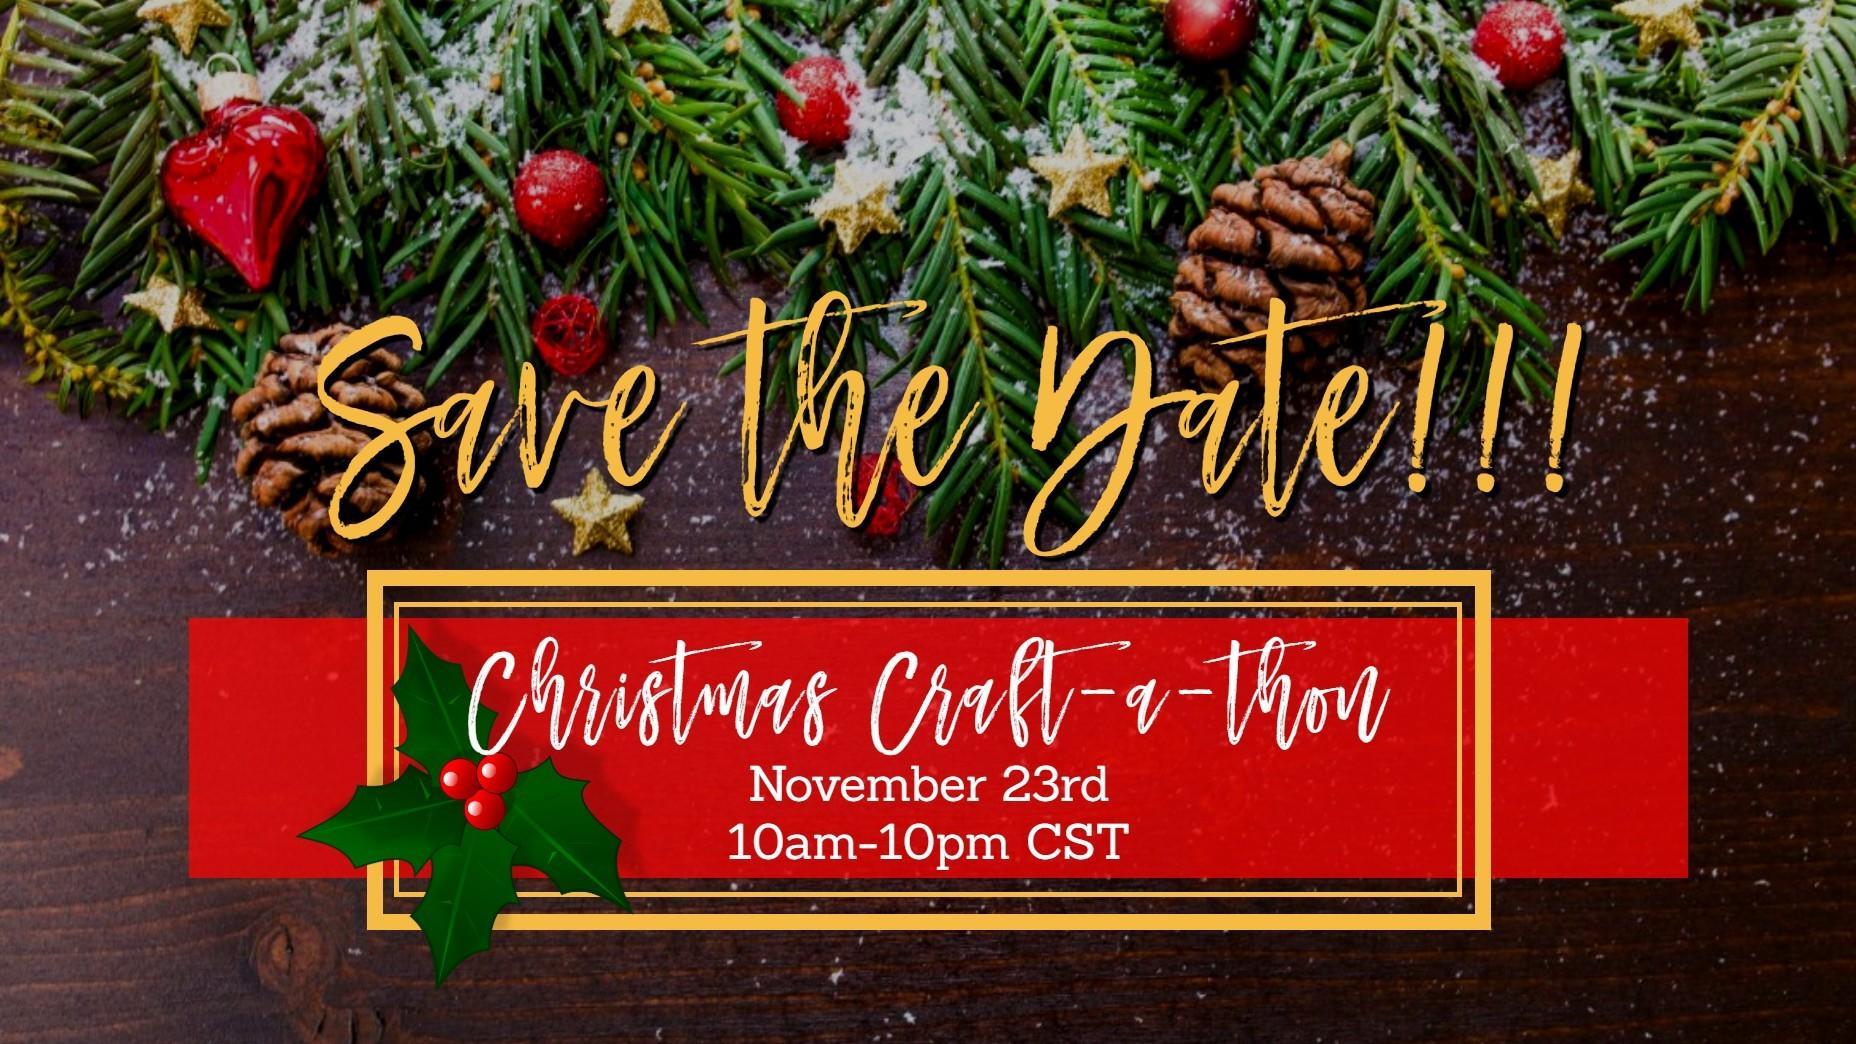 southern crush christmas 2020 craftathon